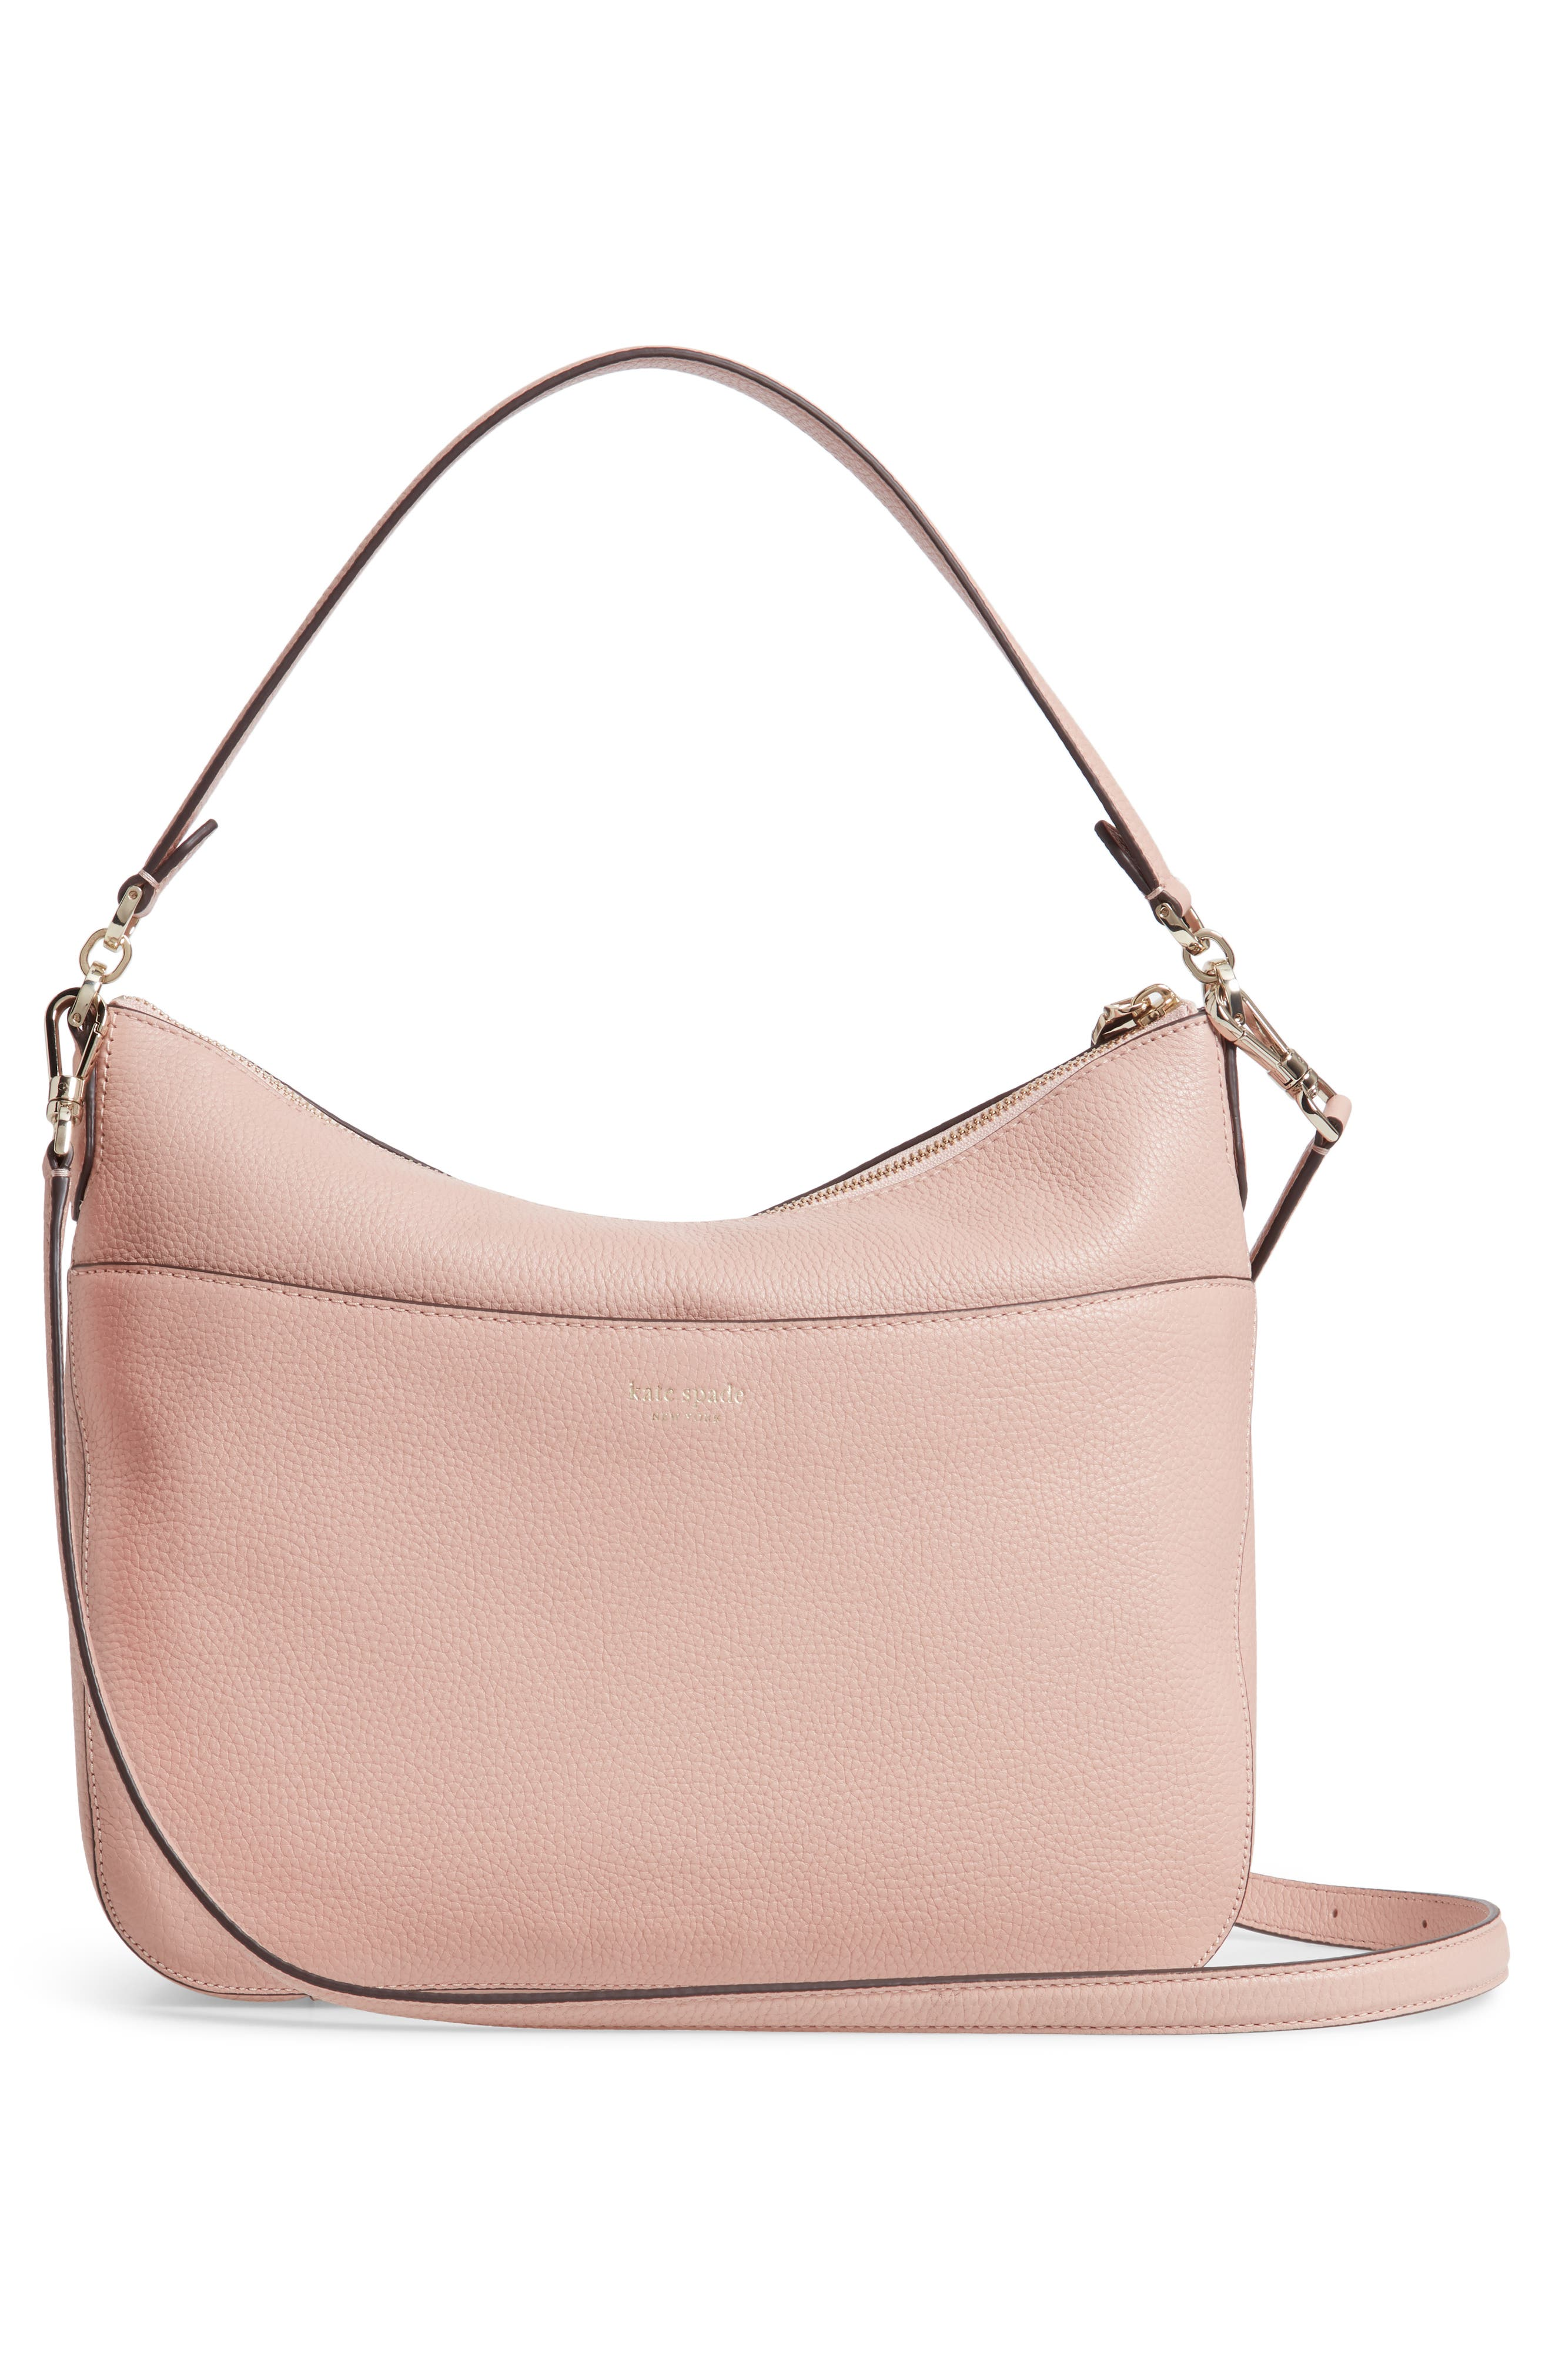 KATE SPADE NEW YORK, medium polly leather shoulder bag, Alternate thumbnail 3, color, FLAPPER PINK